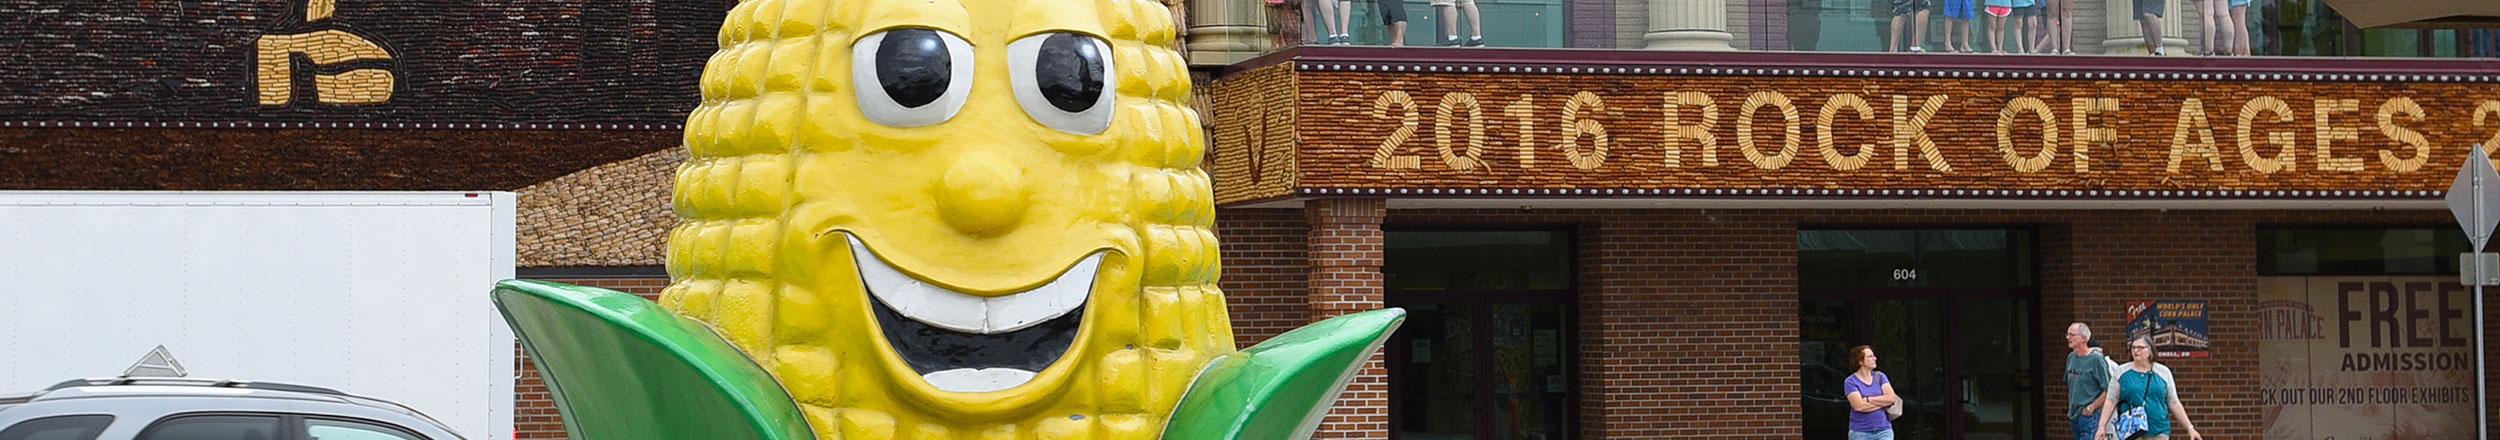 Corn-SDGives-WebsiteBanner.jpg